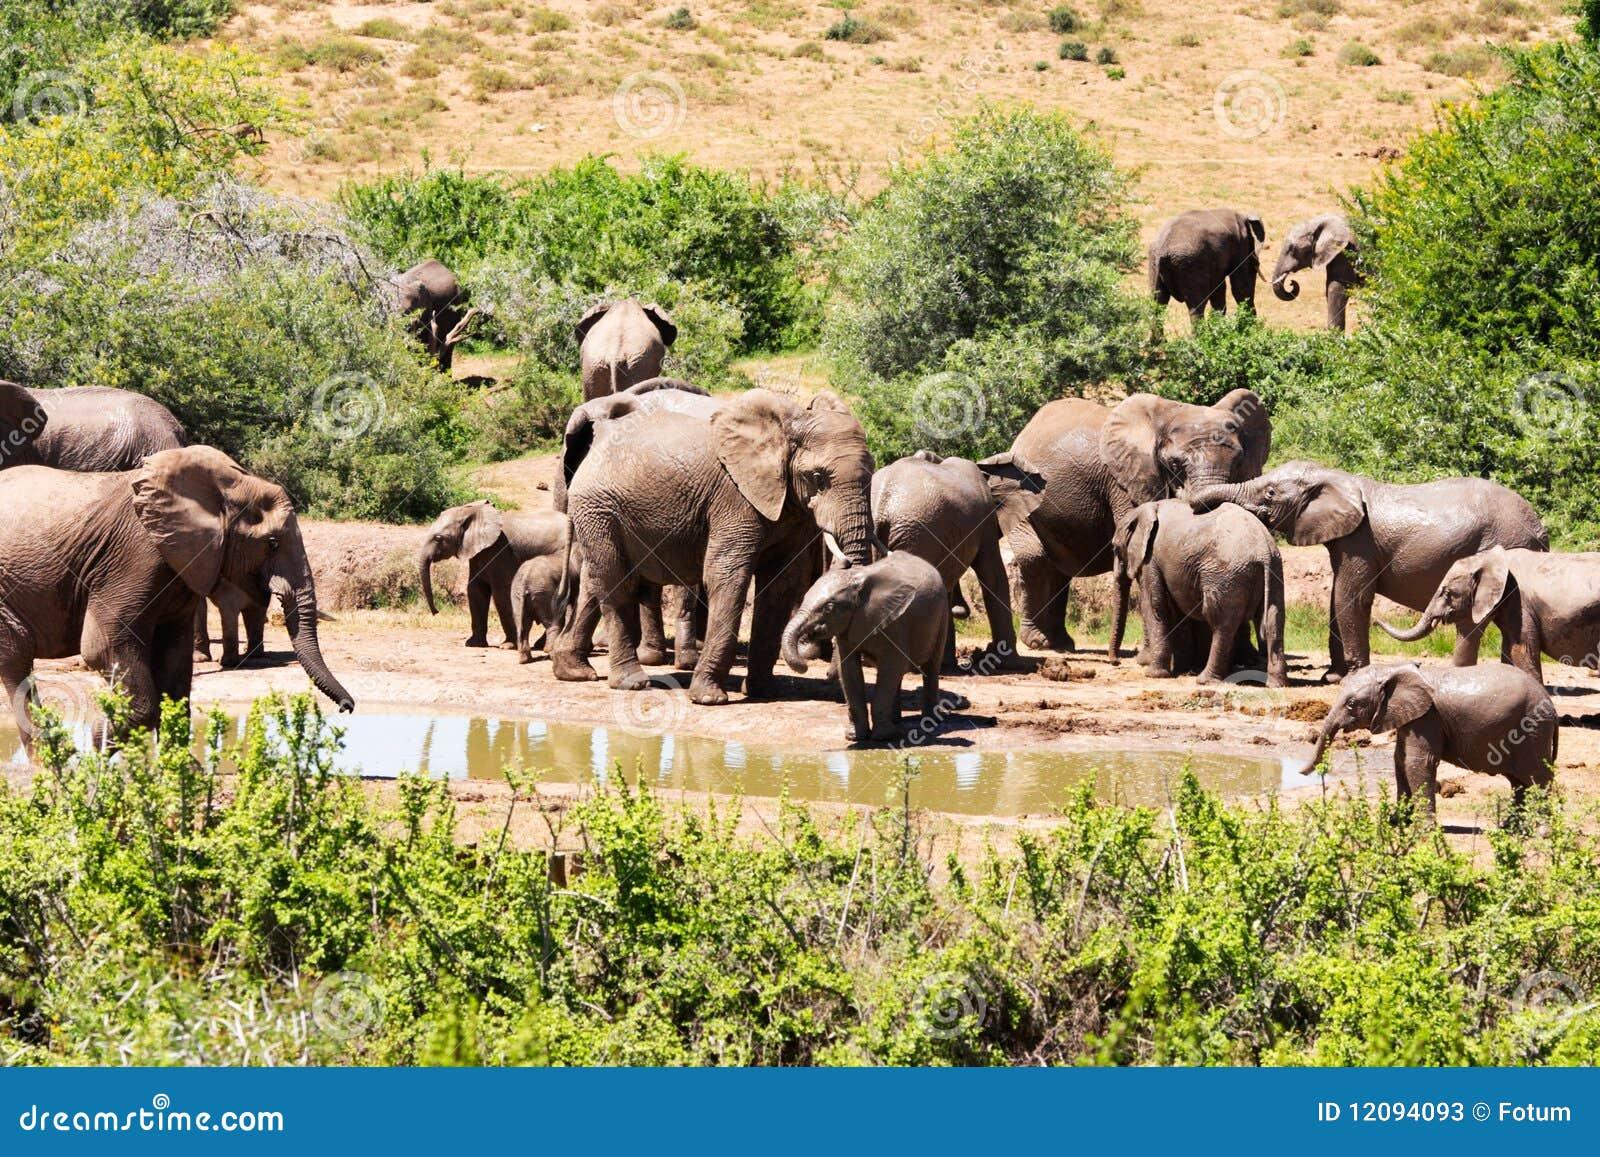 Flock of elephants